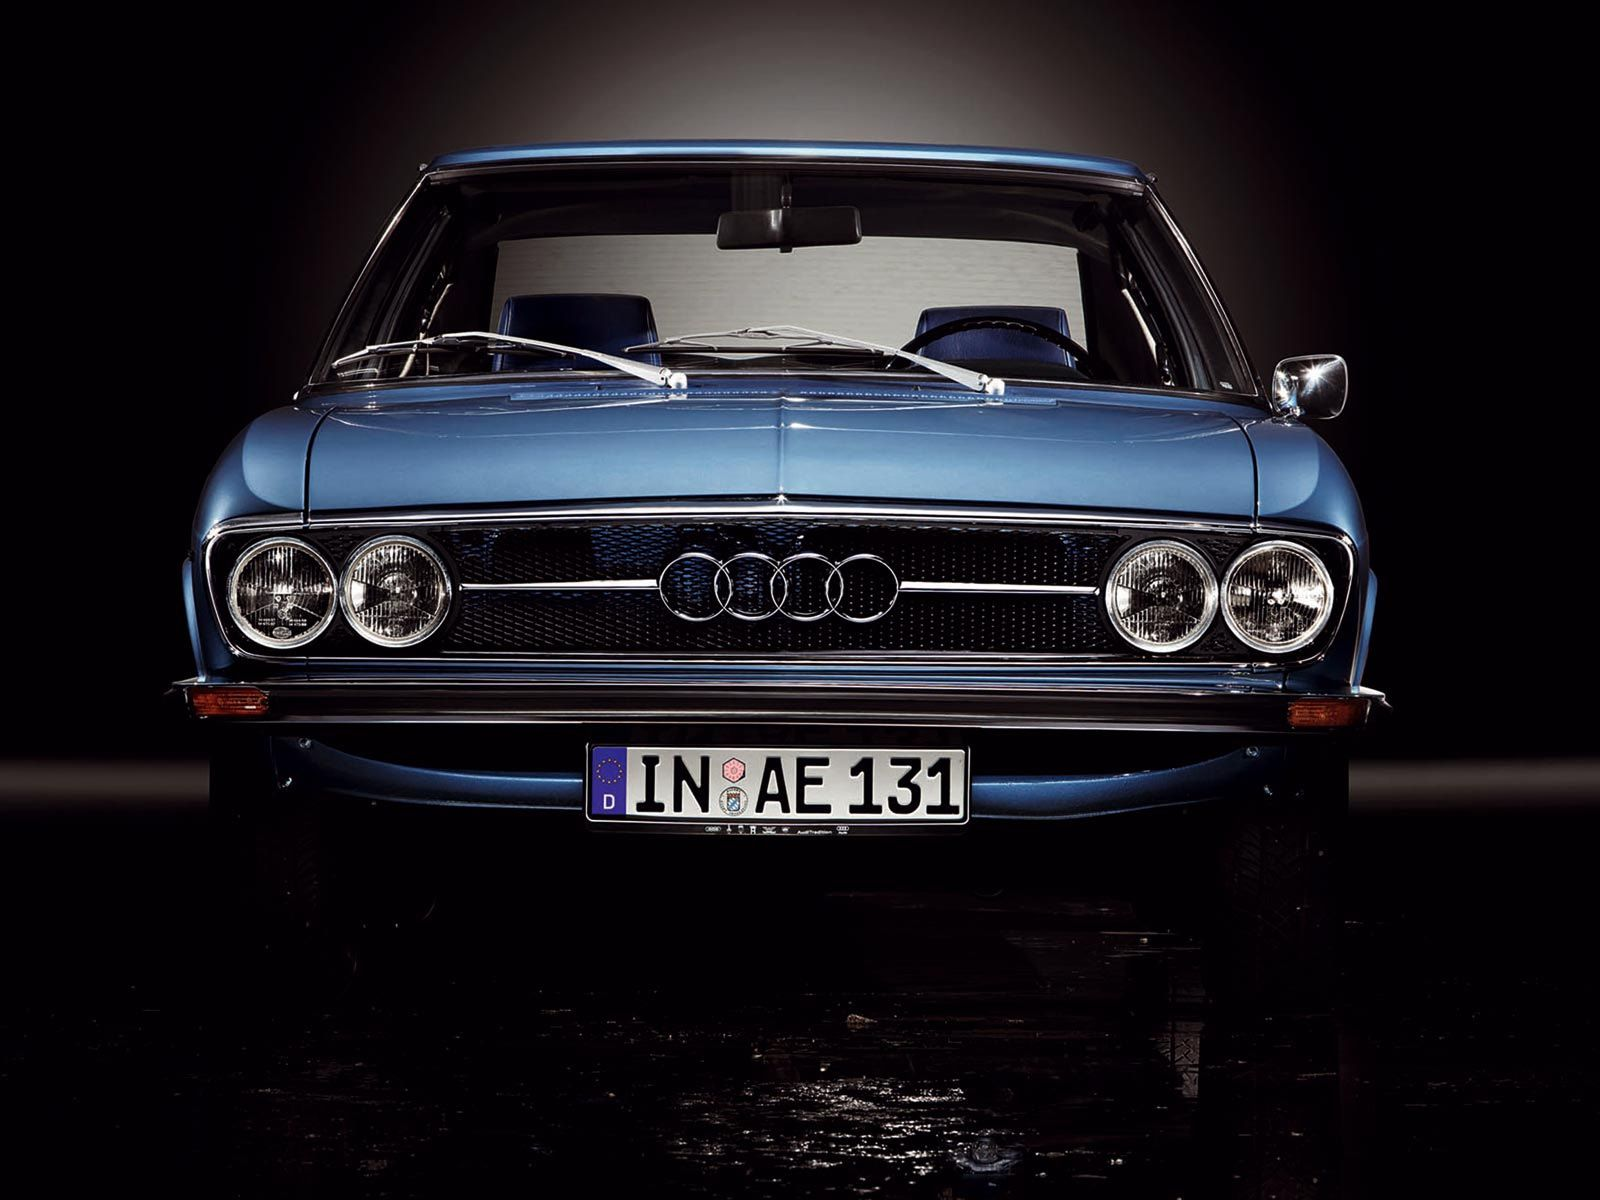 1970 Audi 100 Coupe S Audi 100 Audi Audi Cars